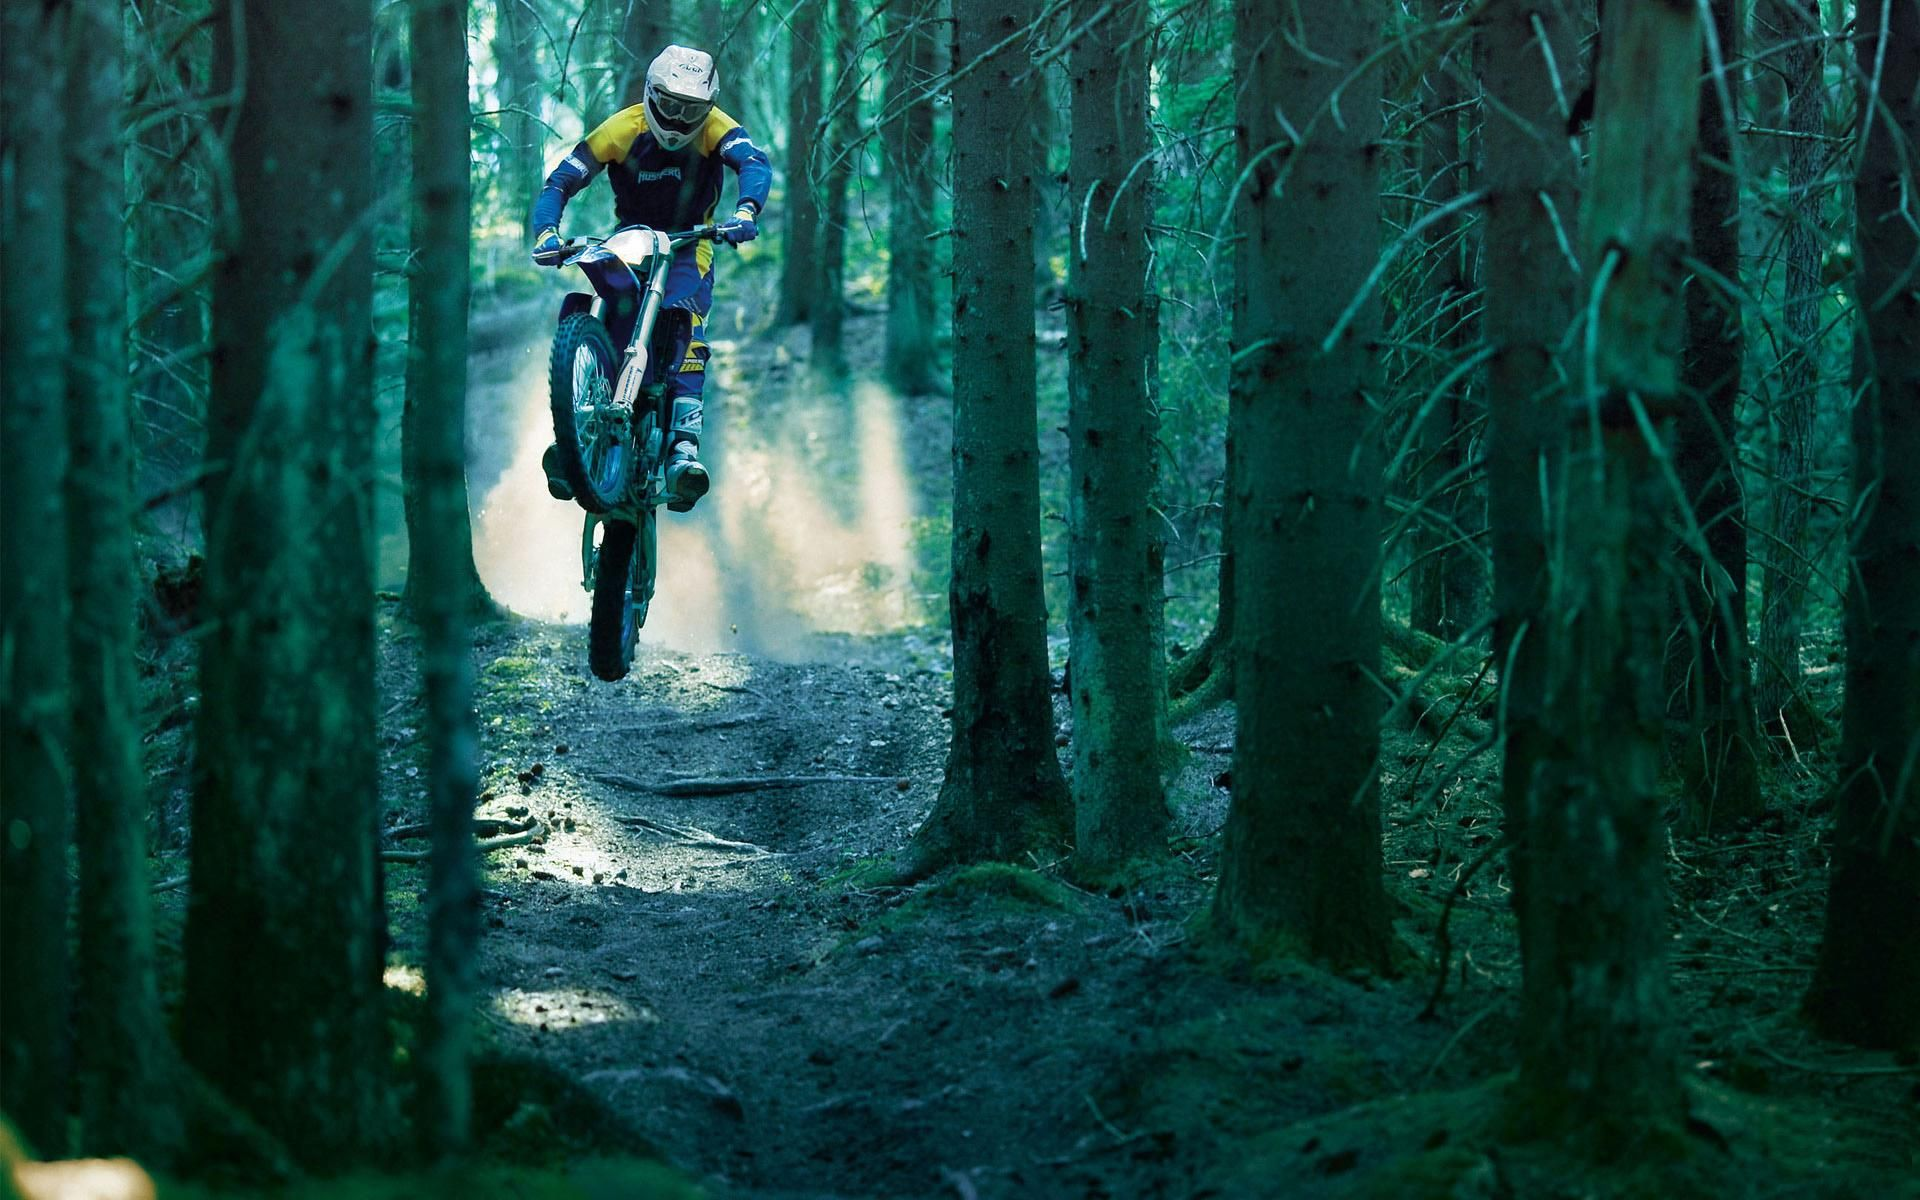 Des Fonds D Ecran Pour Les Sportifs Sports Moto Enduro Motocross Moto Cross